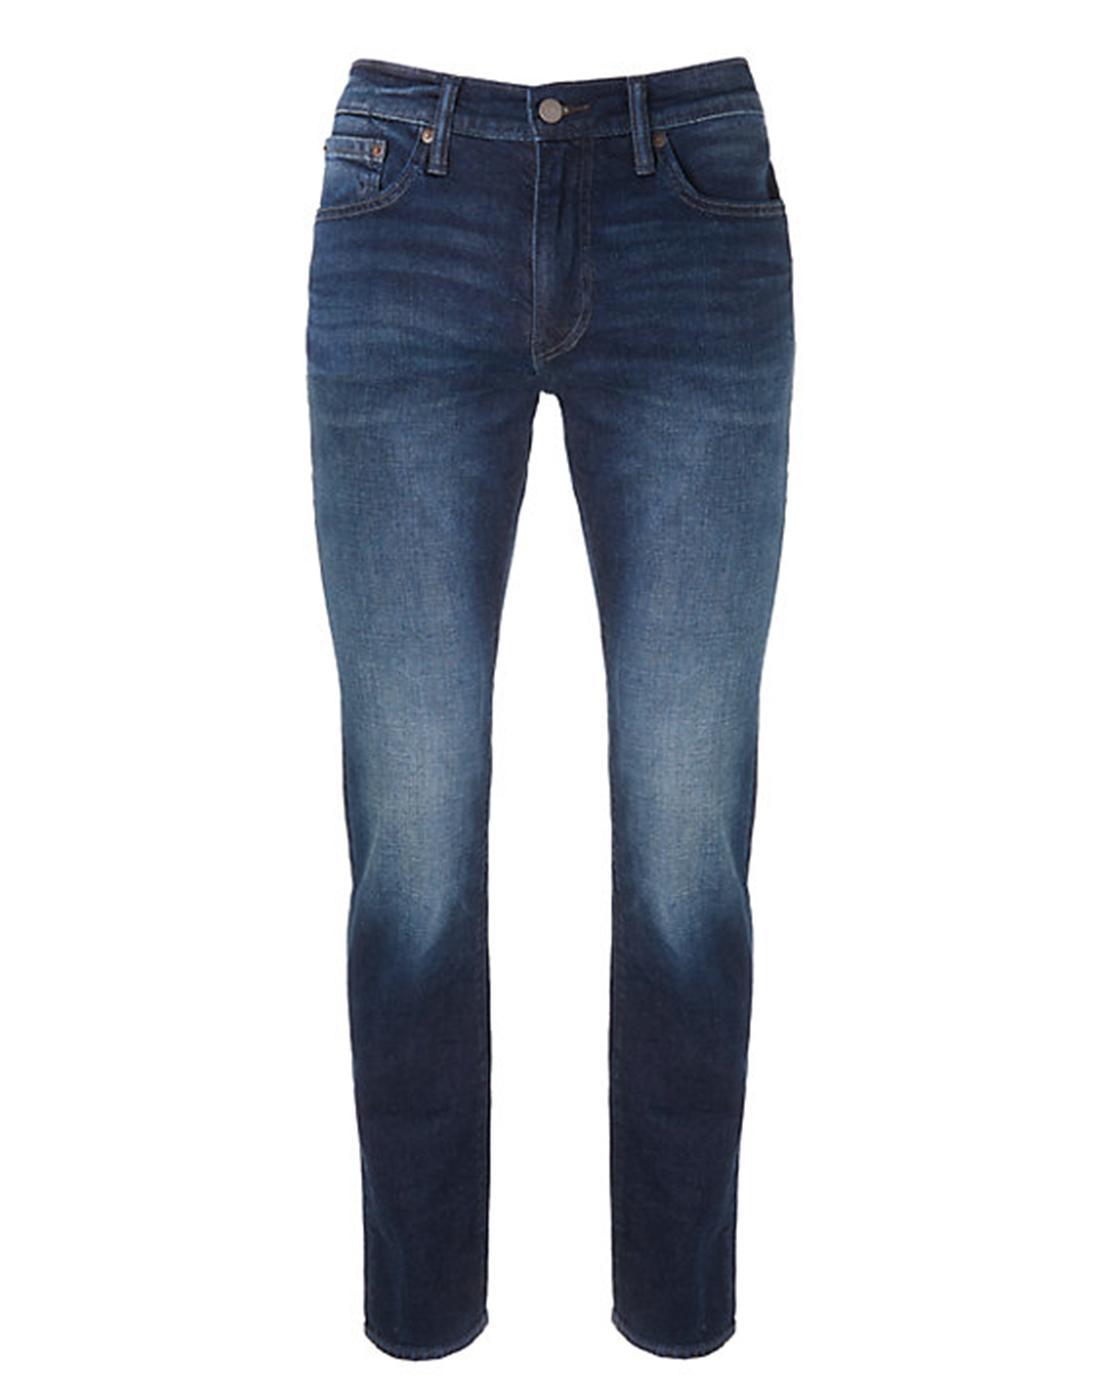 LEVI'S 511 Mens Slim Denim Jeans IF I WERE QUEEN